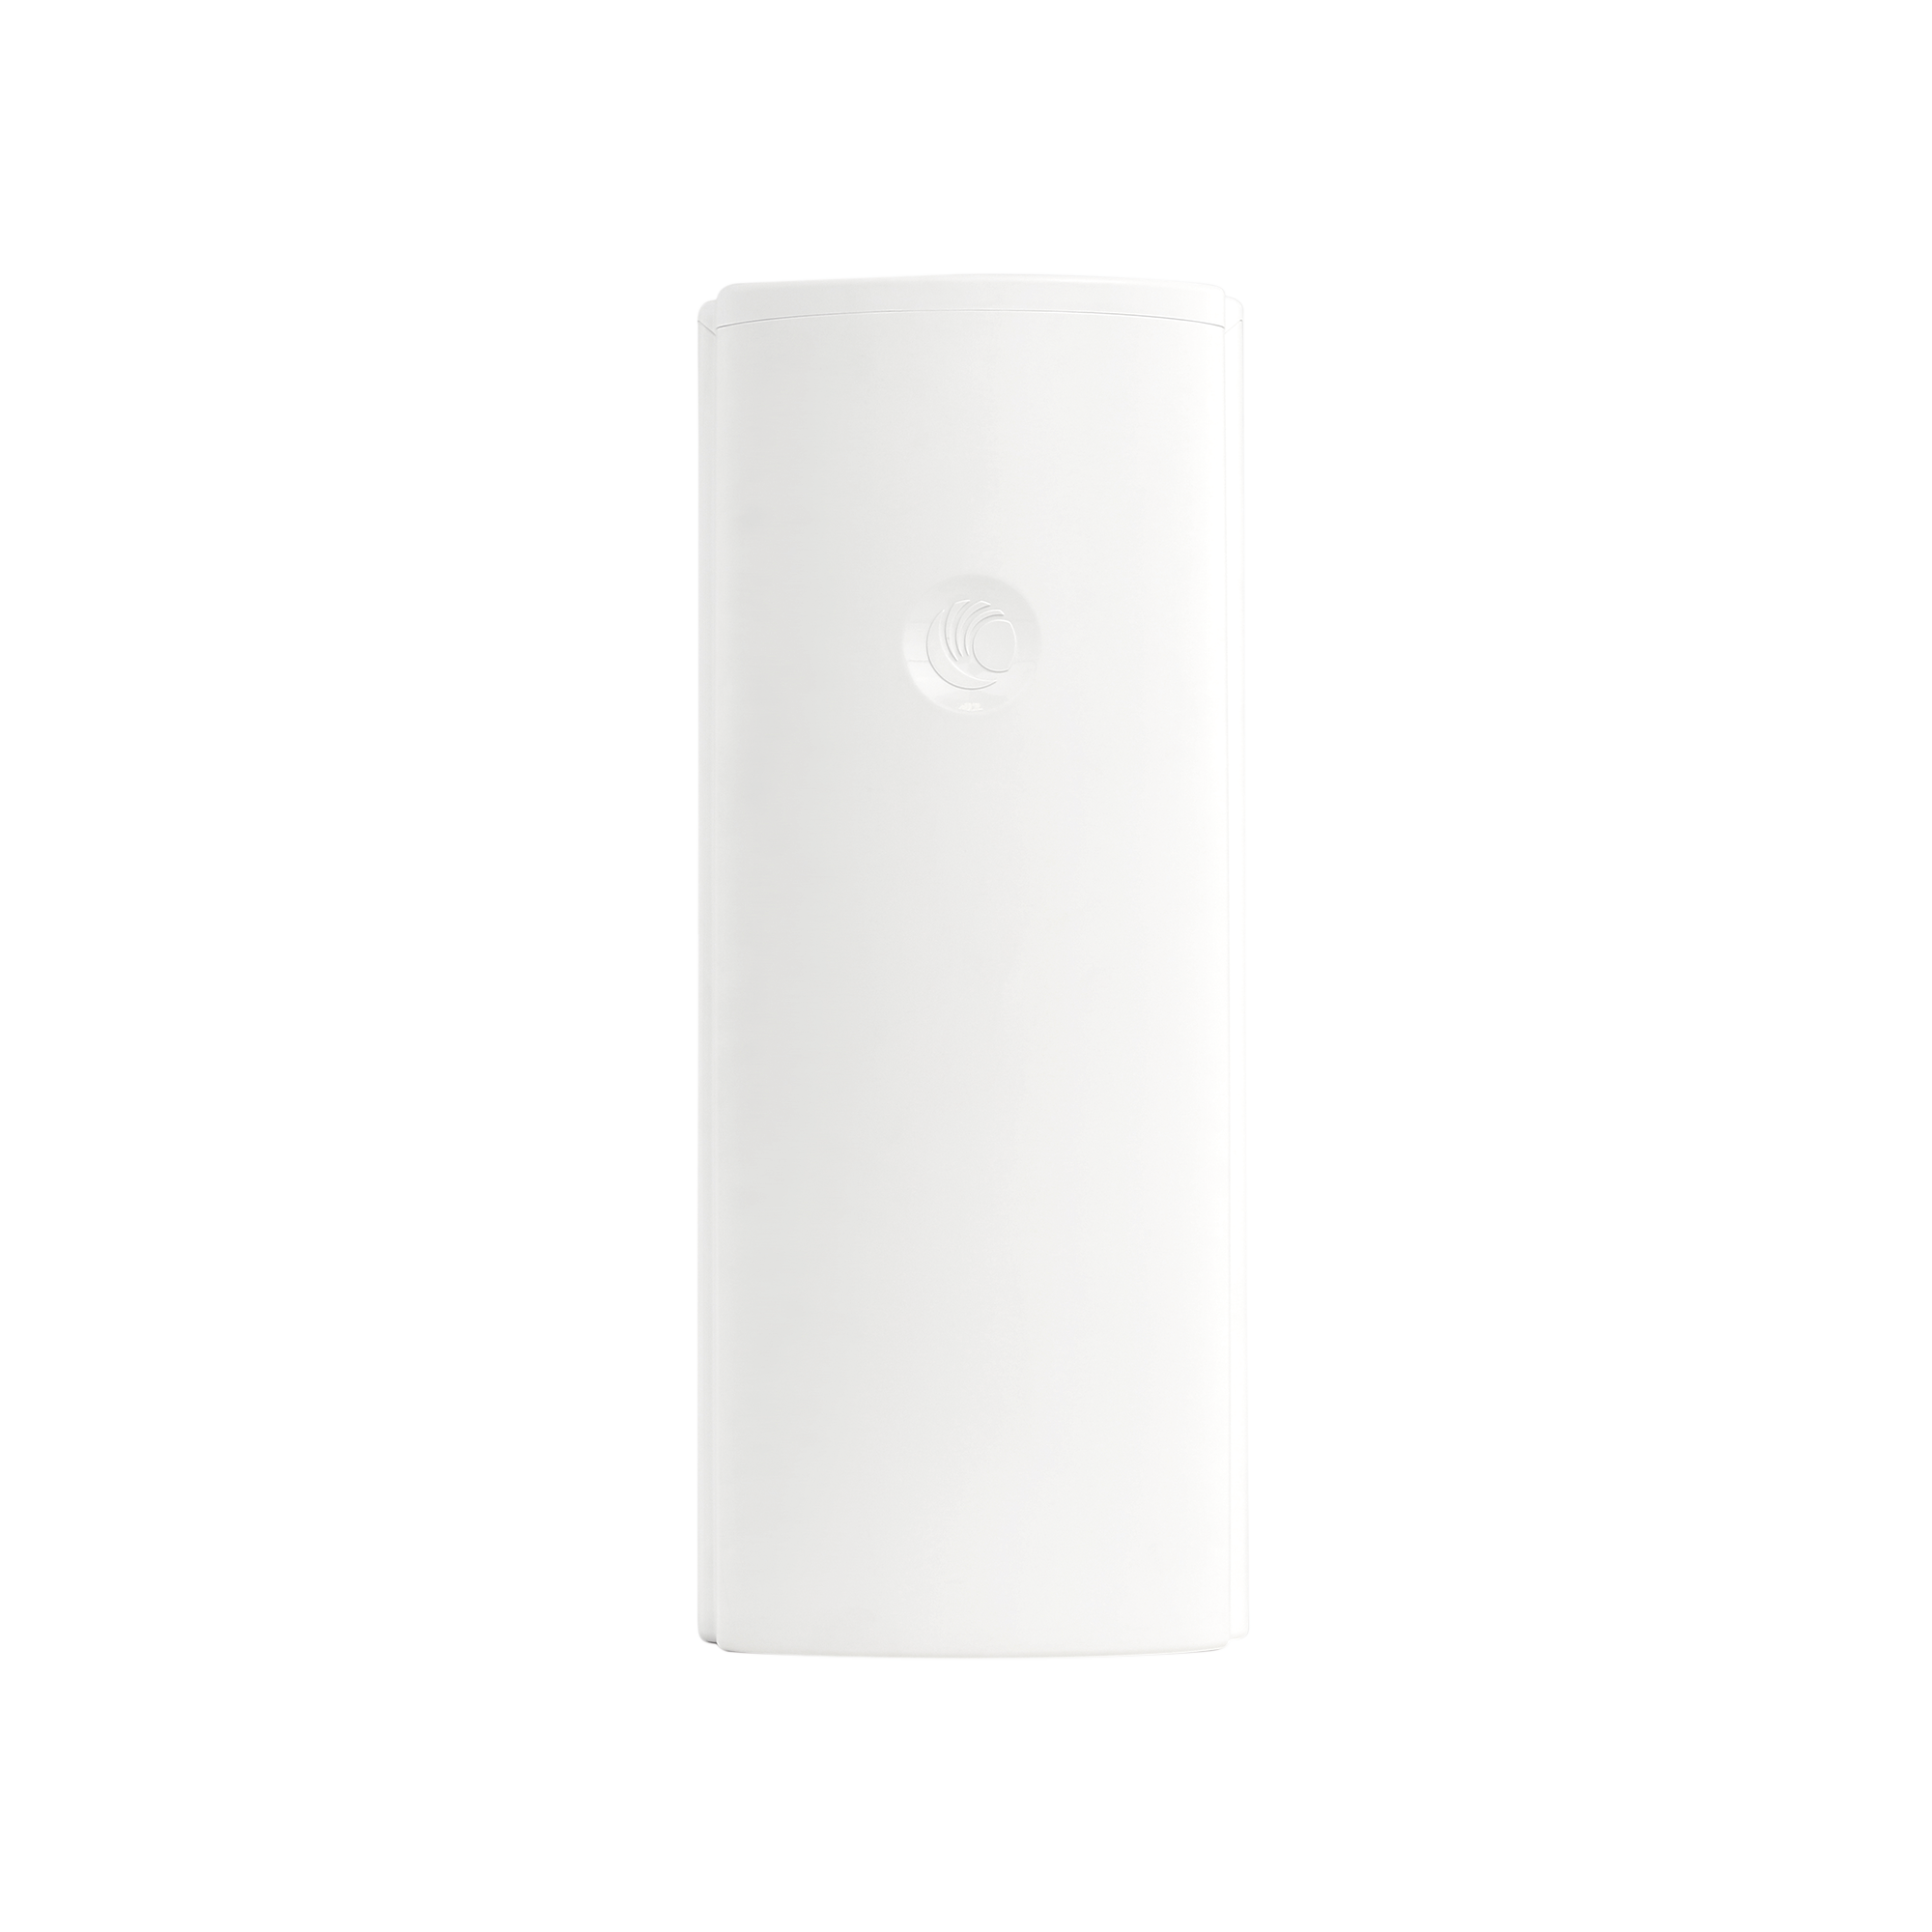 Antena sectorial ePMP 3000 de 90 grados, 17 dBi, 4.9-5.97 GHz, MU-MIMO 4x4, incluye kit de montaje para EPMP3K